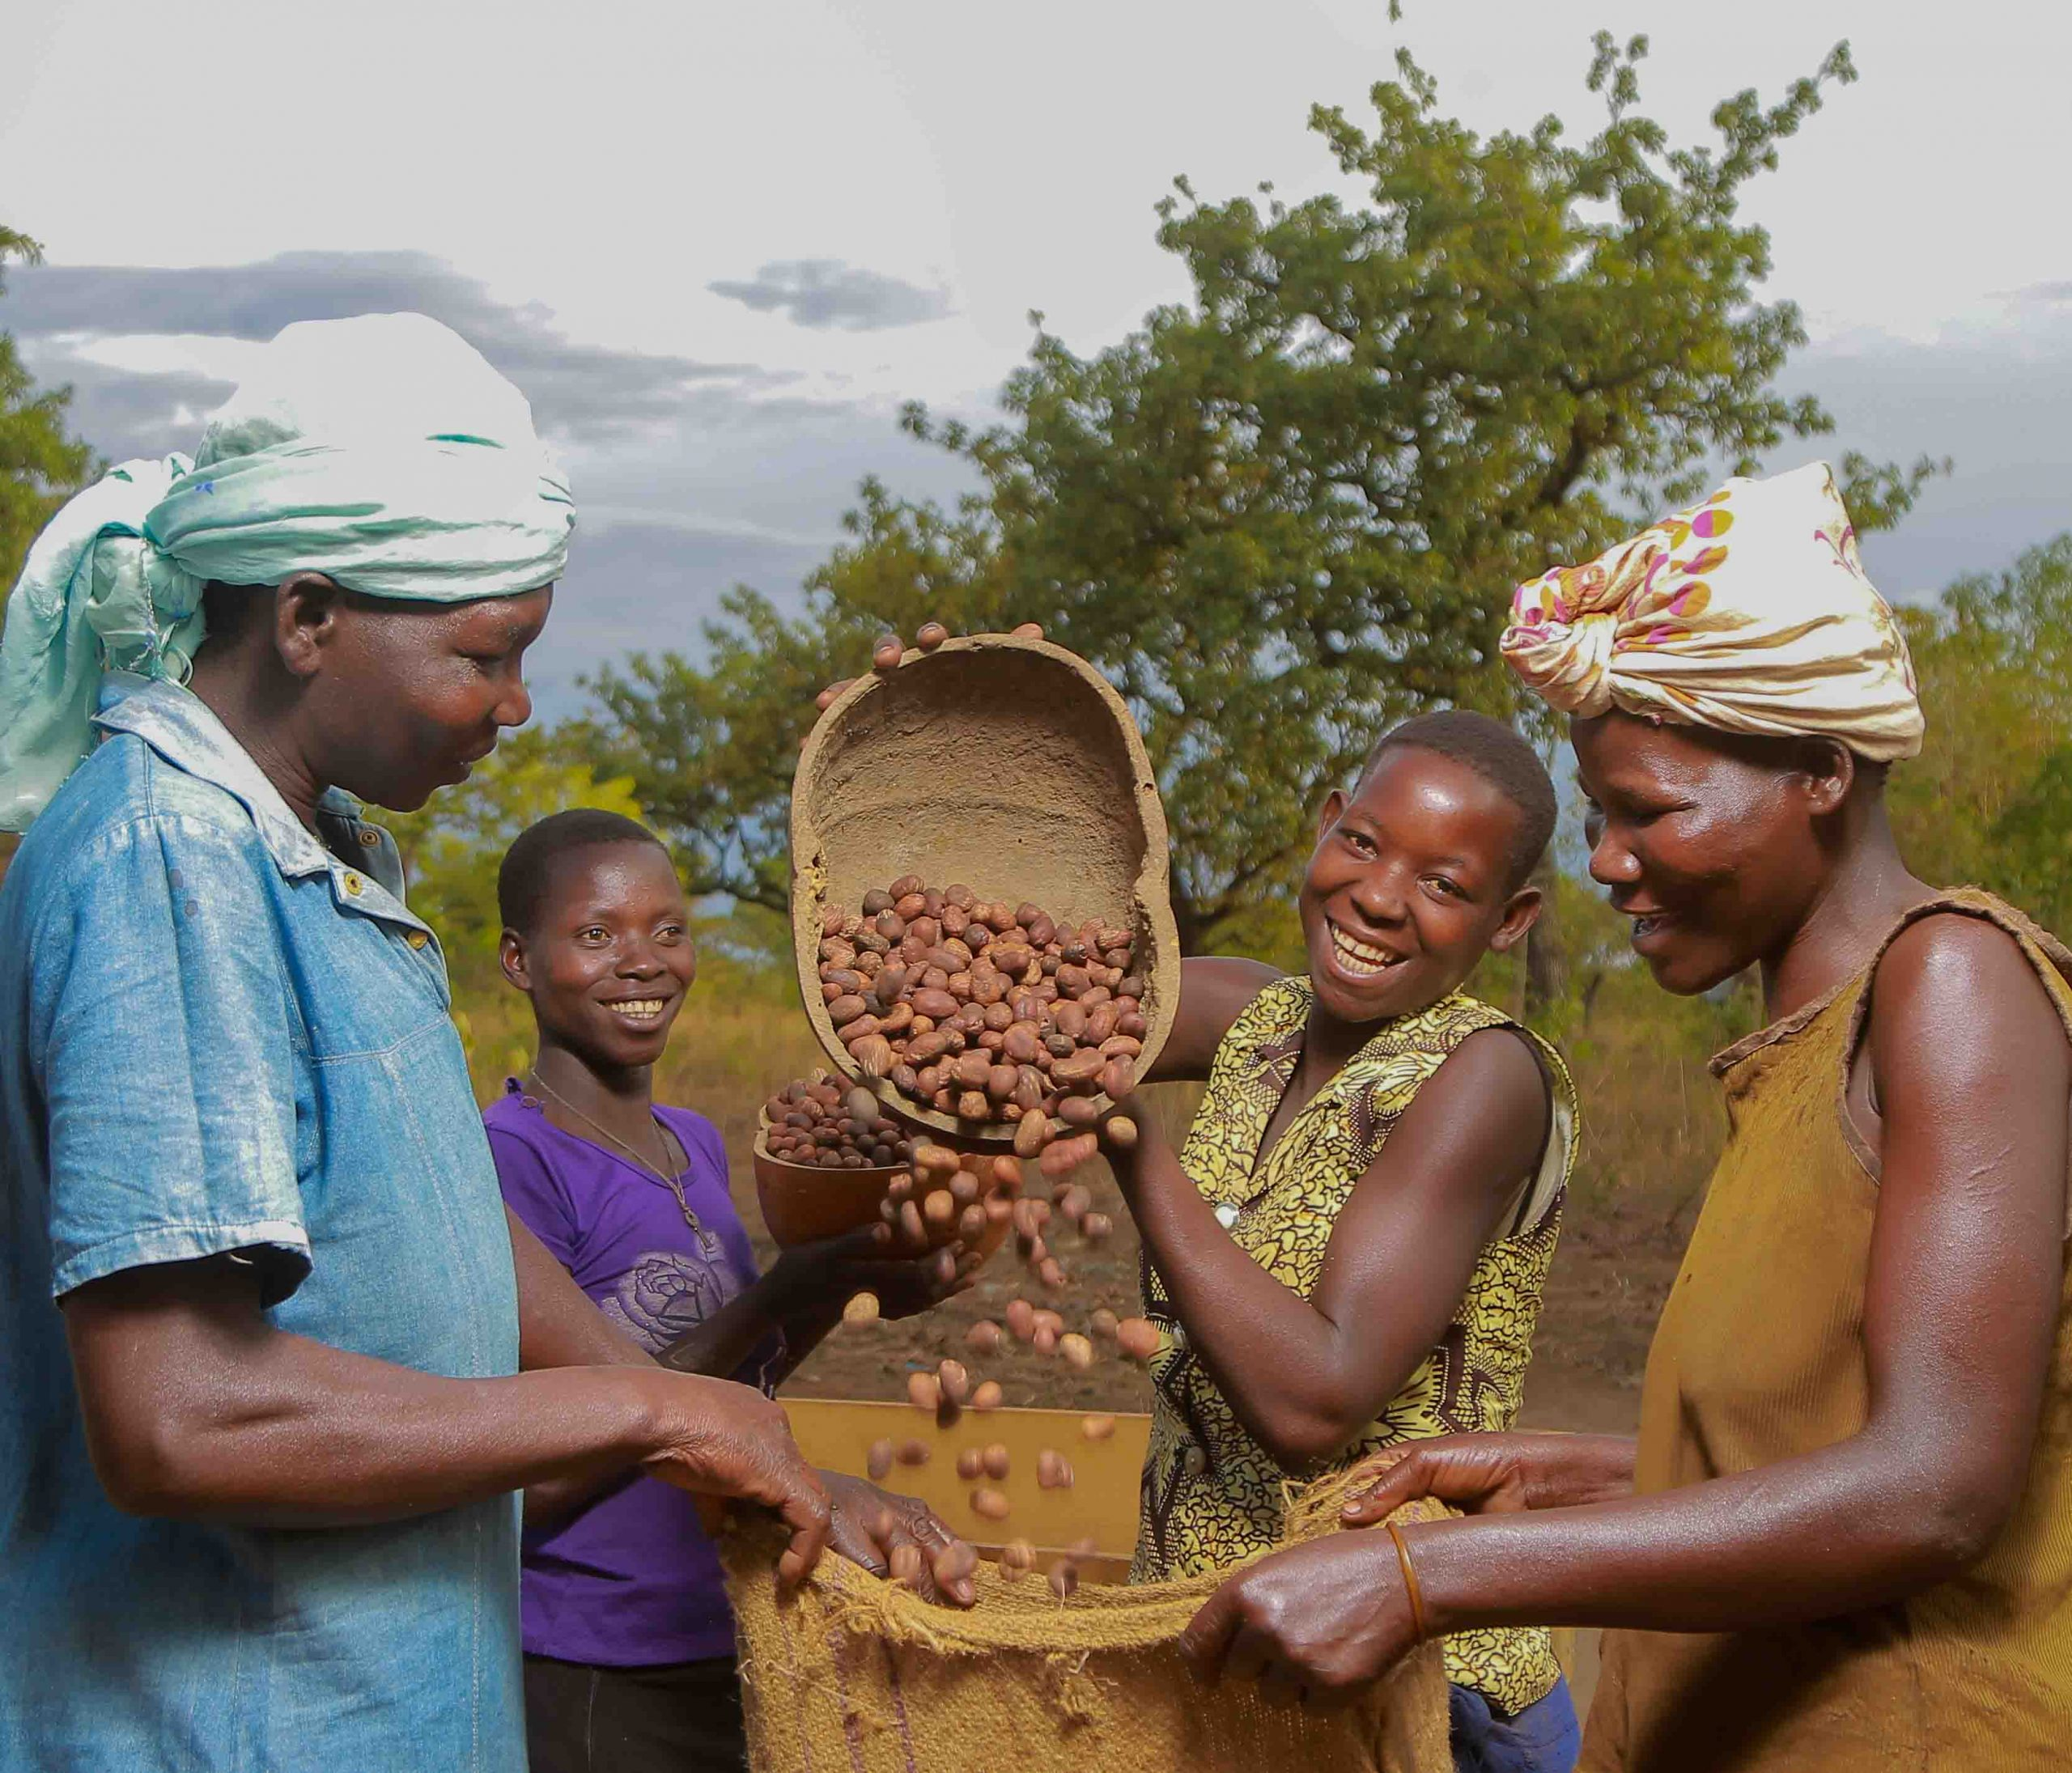 Bagging the Nilotica shea nuts